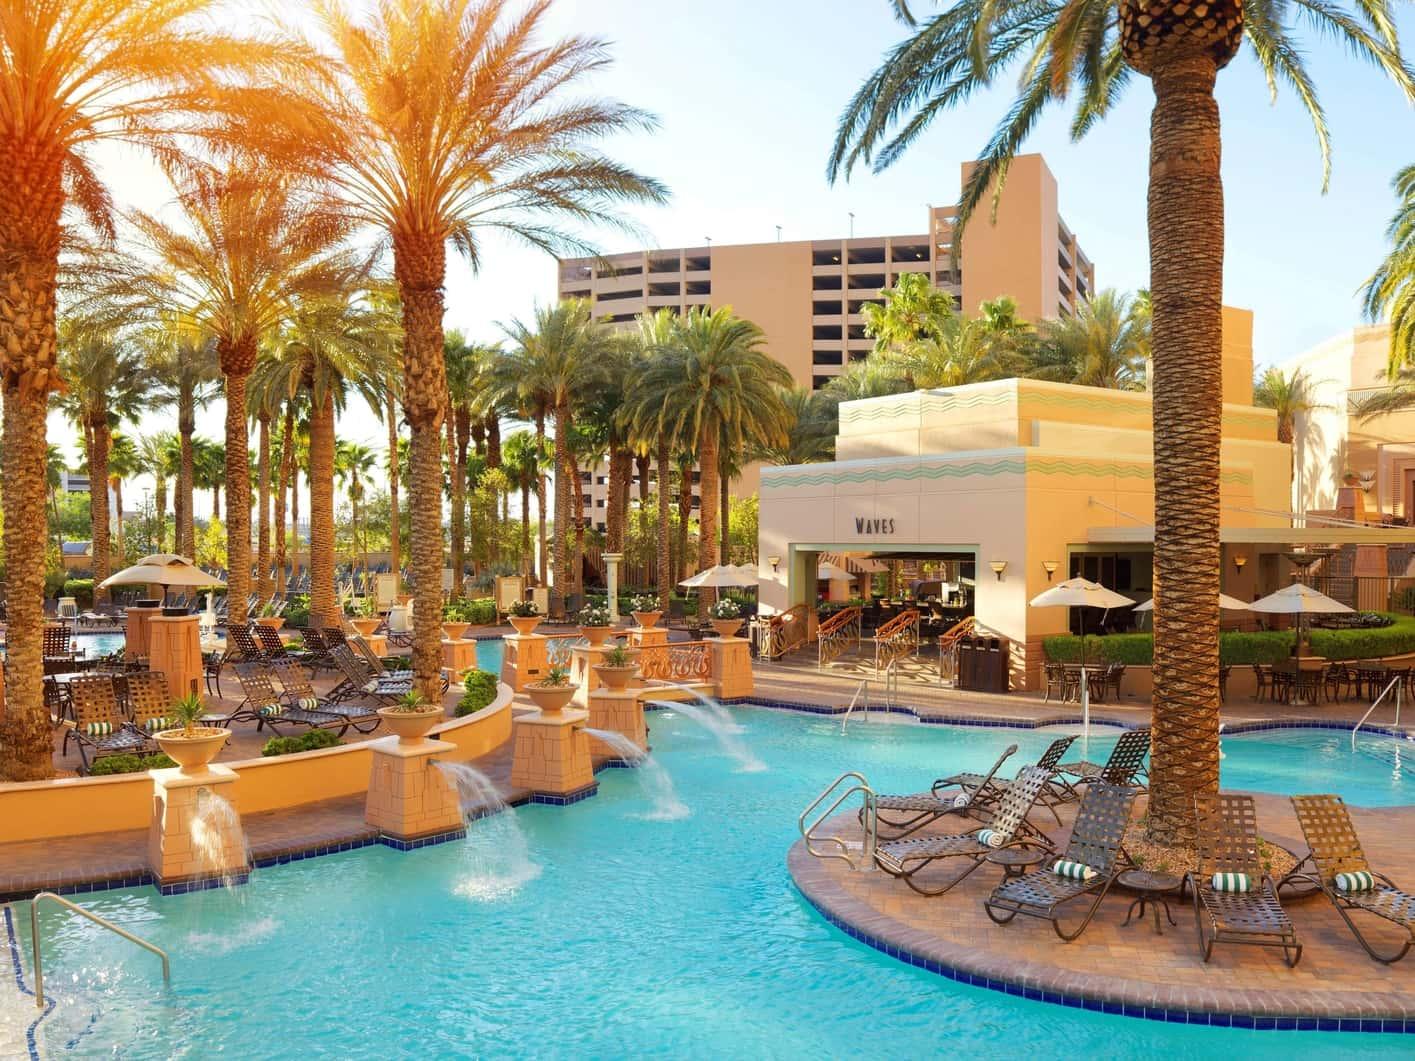 Hilton Grand Vacations Suites, kid-friendly hotel in Las Vegas